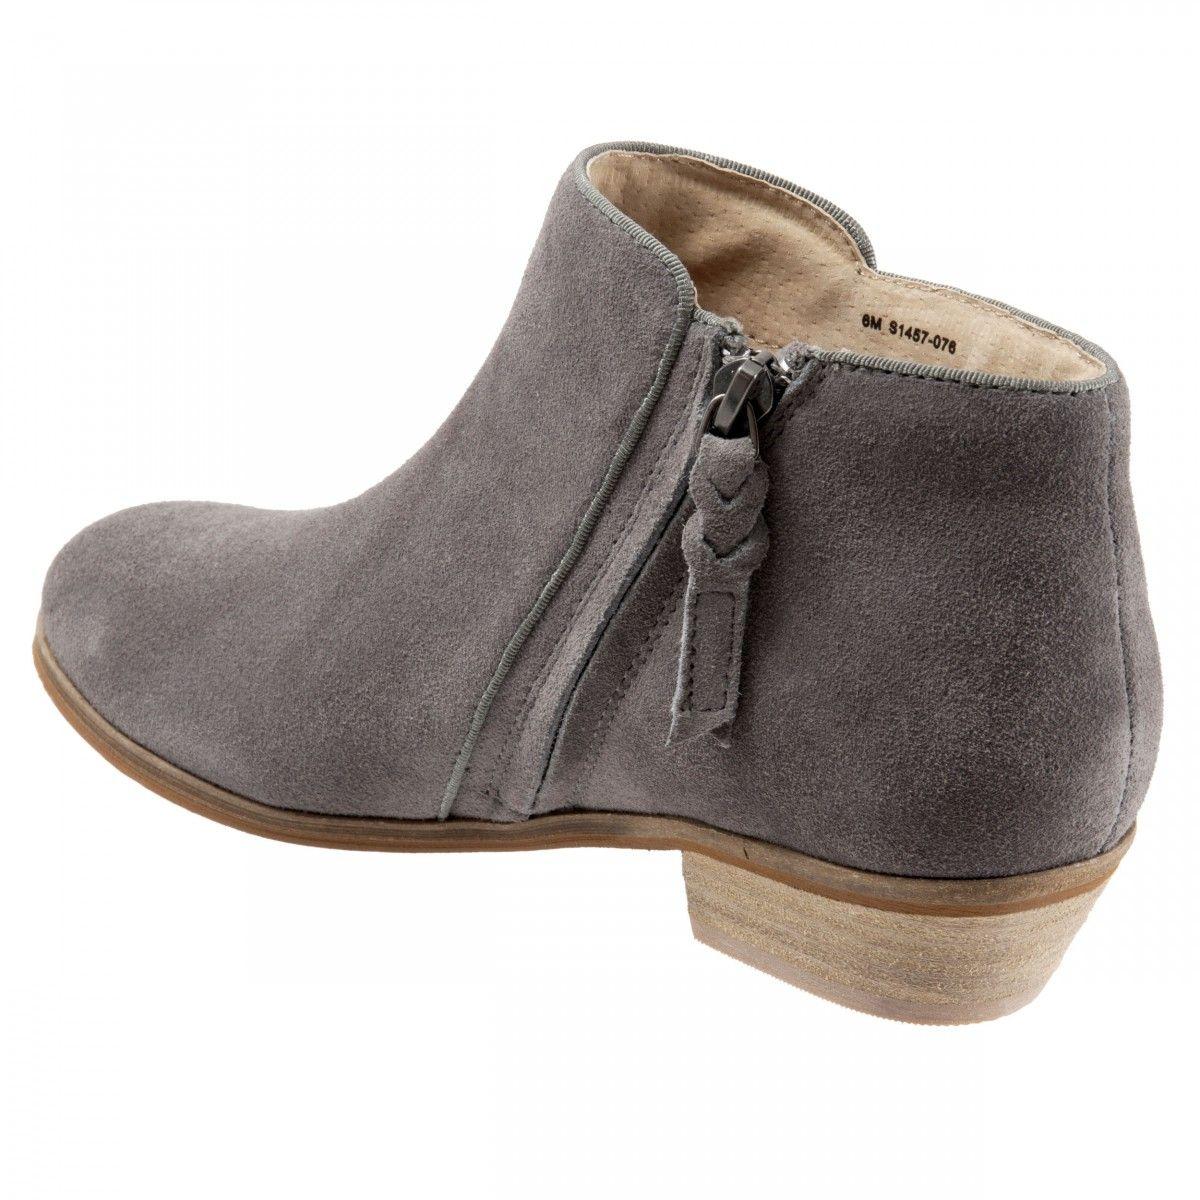 0da6772d92ab28 Softwalk Rocklin - Women s Low Cut Boots in 2019